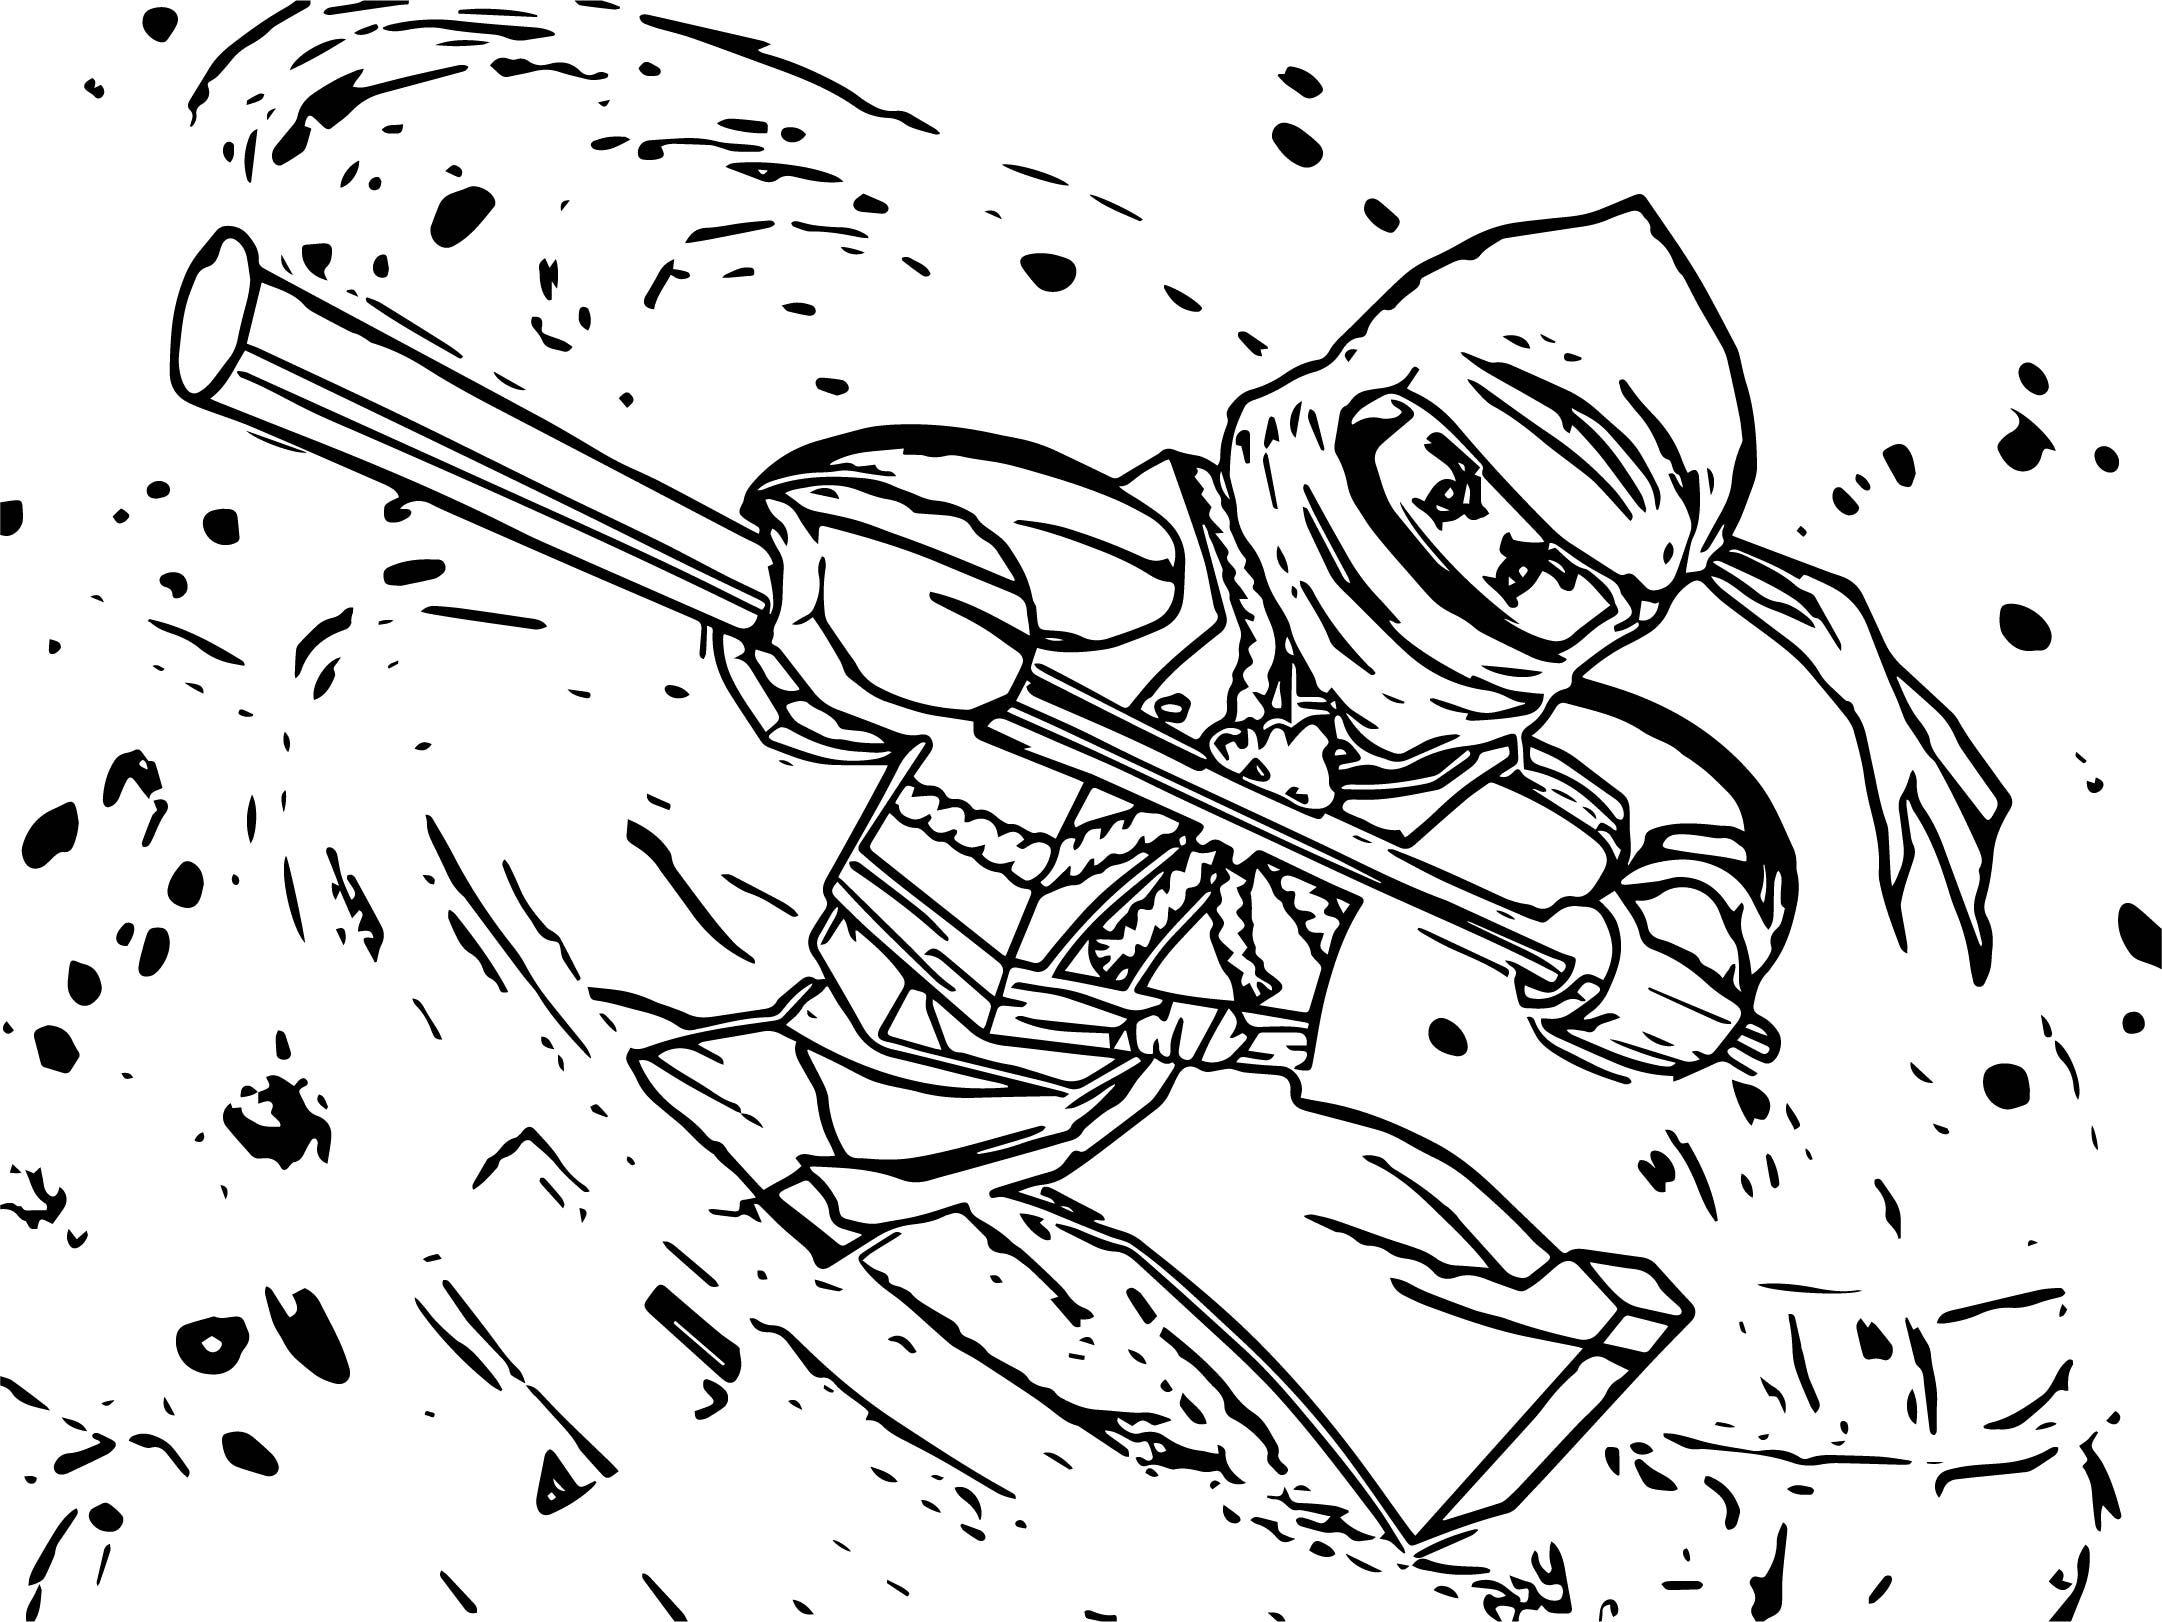 Cool Cartoon Network Ninjago Master Of Spinjitzu Coloring Page Cartoon Coloring Pages Coloring Pages Winter Dinosaur Coloring Pages